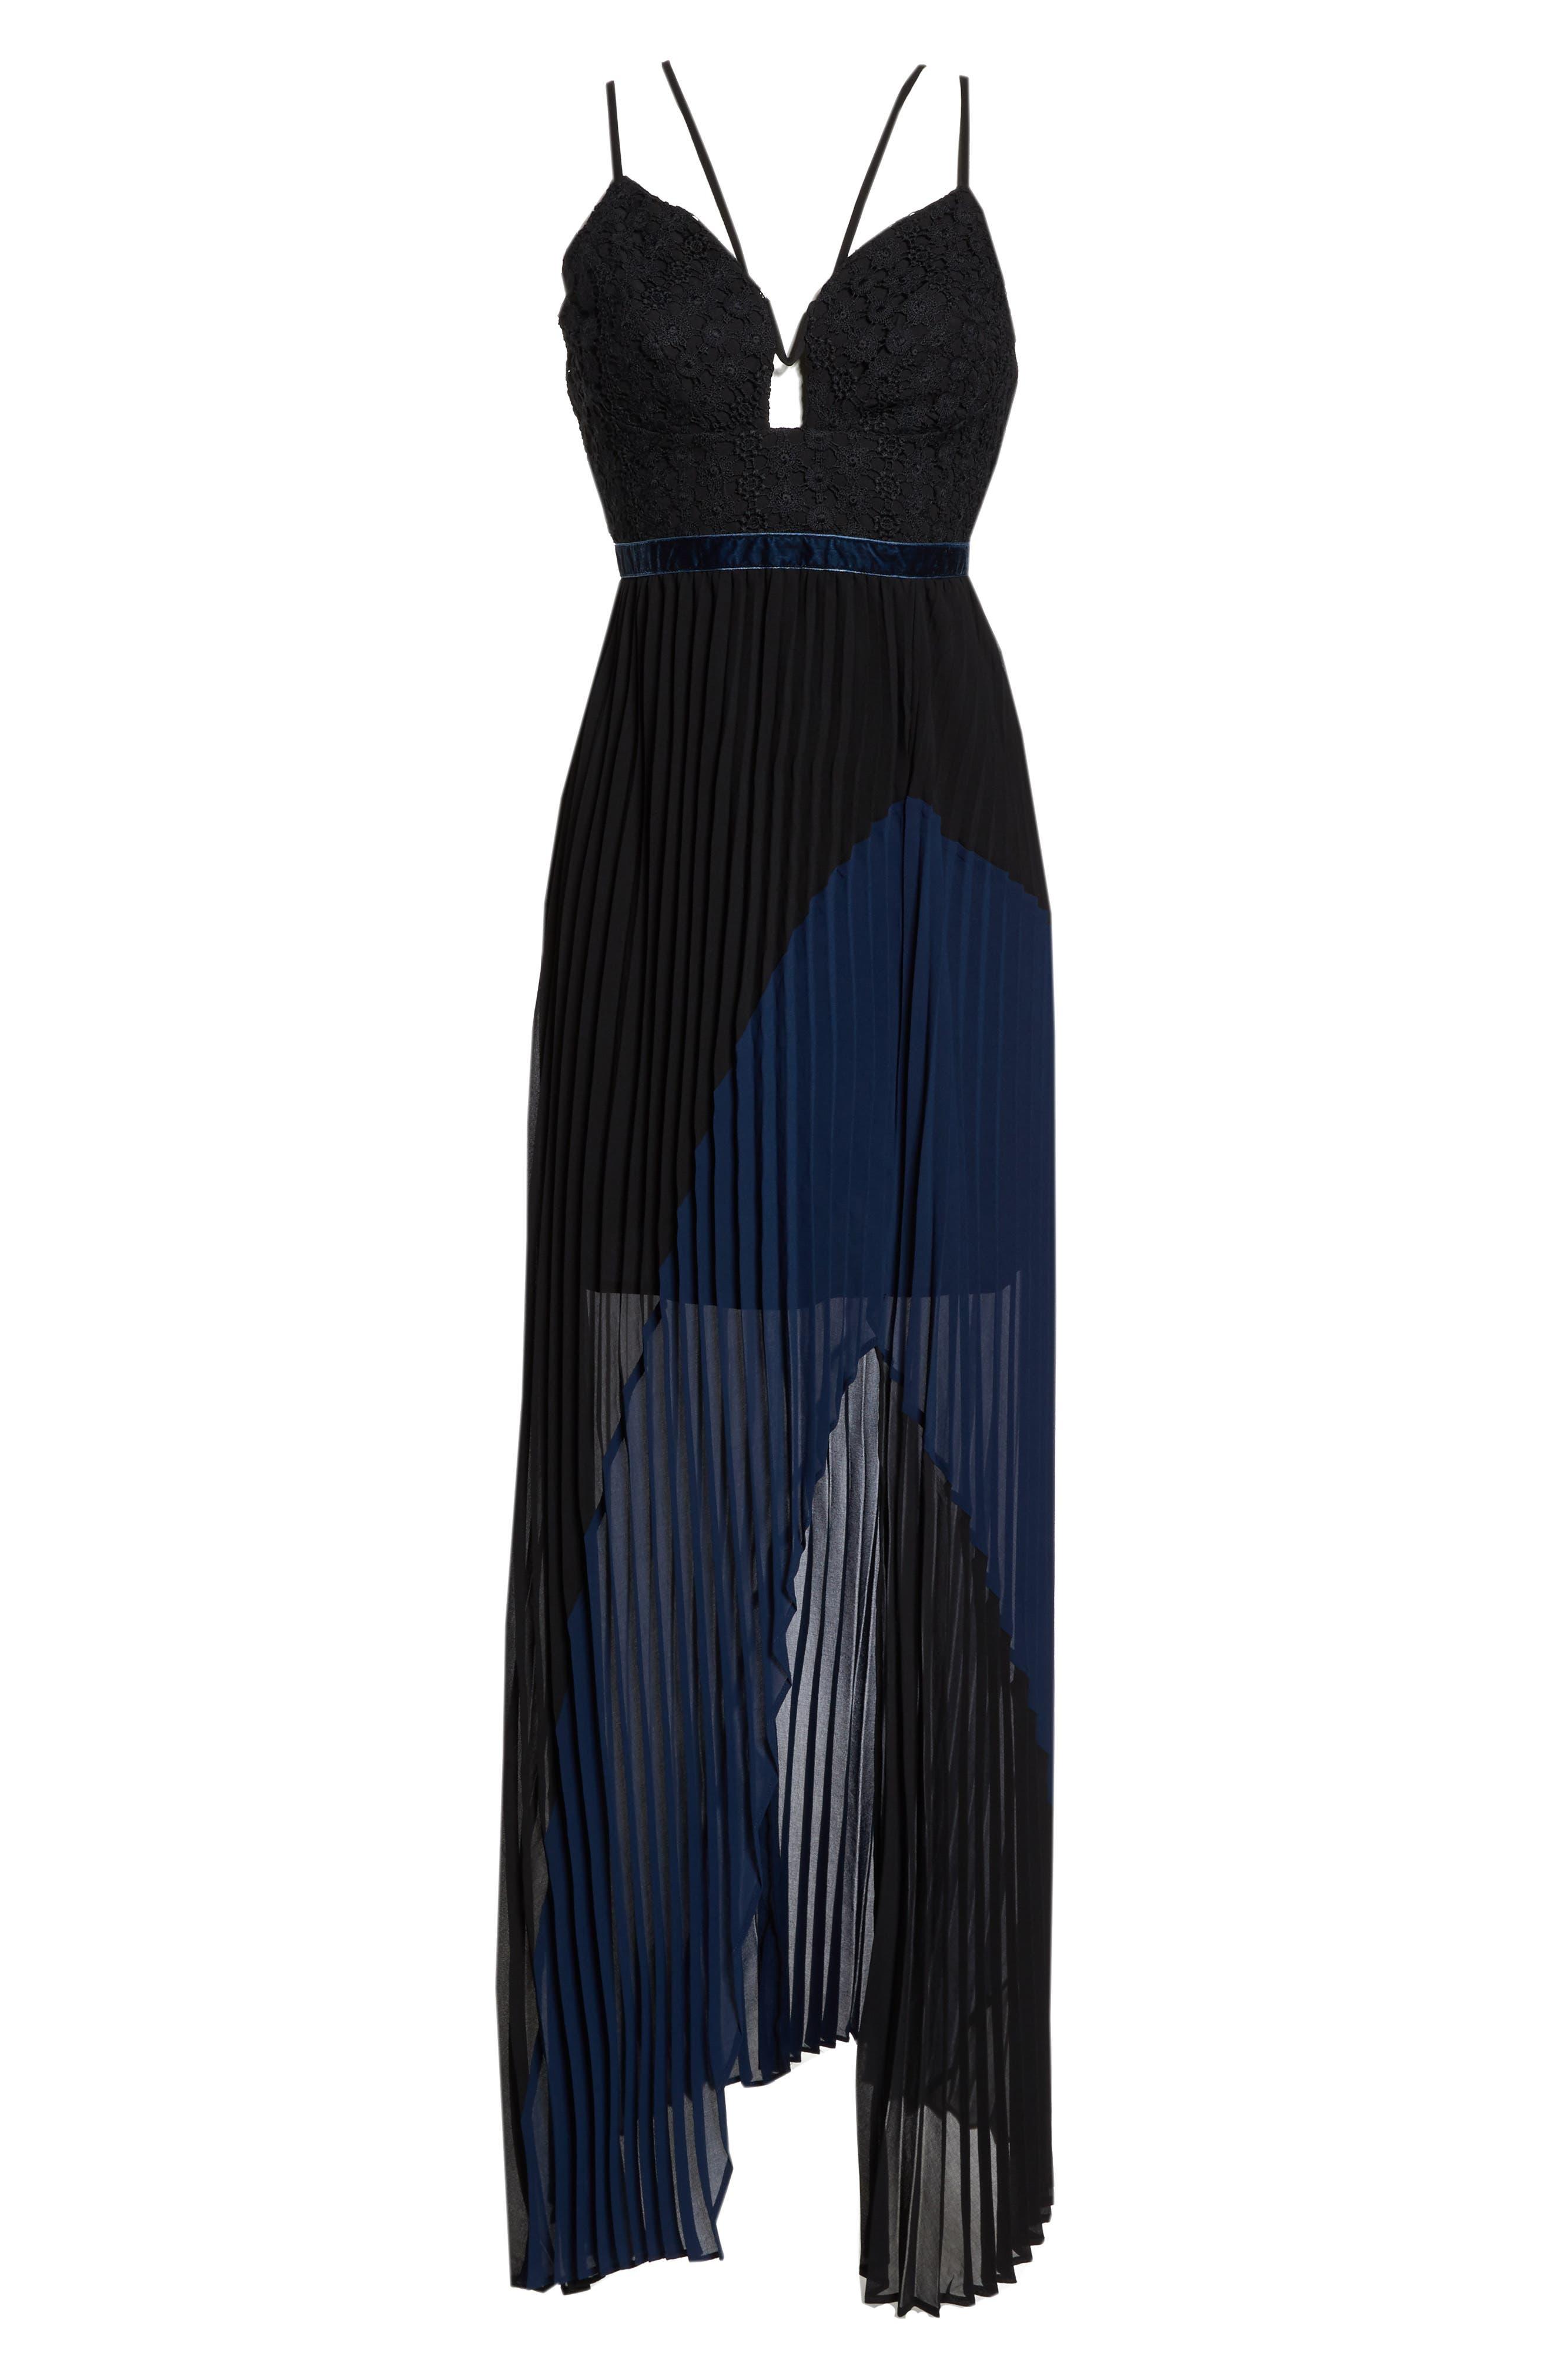 Nealea Pleat Chiffon Gown,                             Alternate thumbnail 7, color,                             Black/ Navy